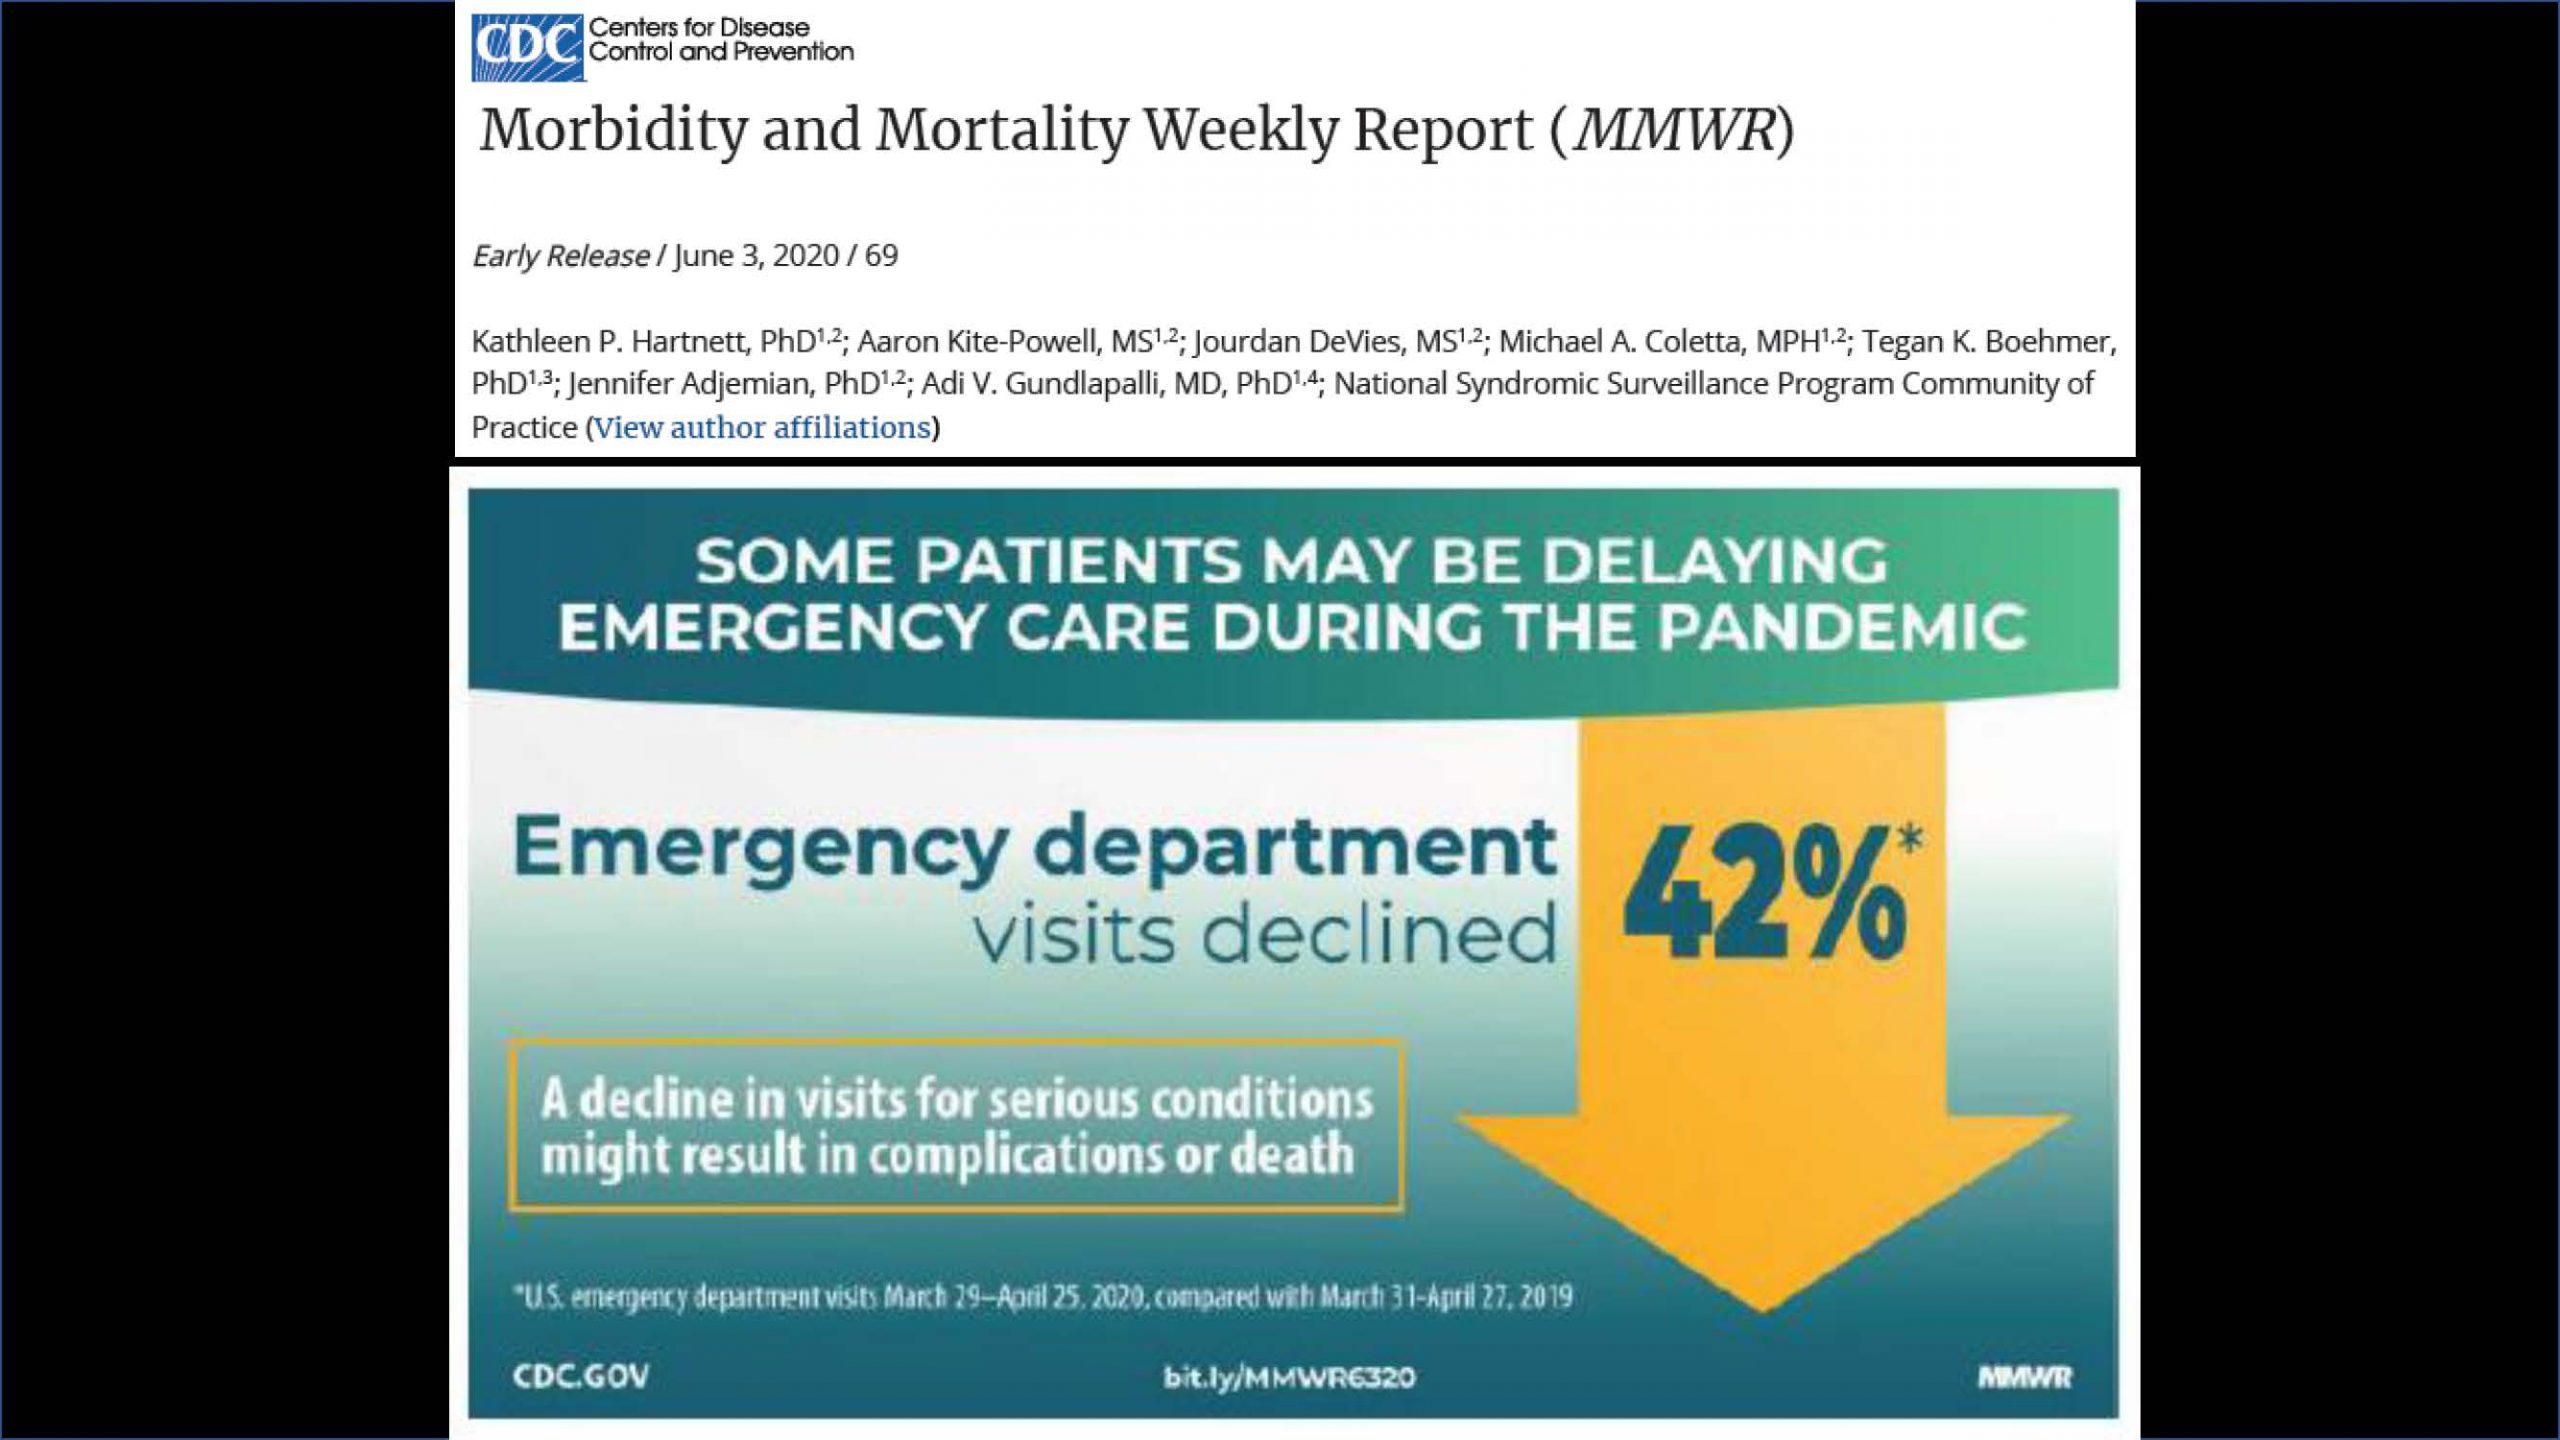 Chapman Info on Ward 7 & 8 _Webinar_Covid 19 Drugs and Mental Health2_07232020_Page_36